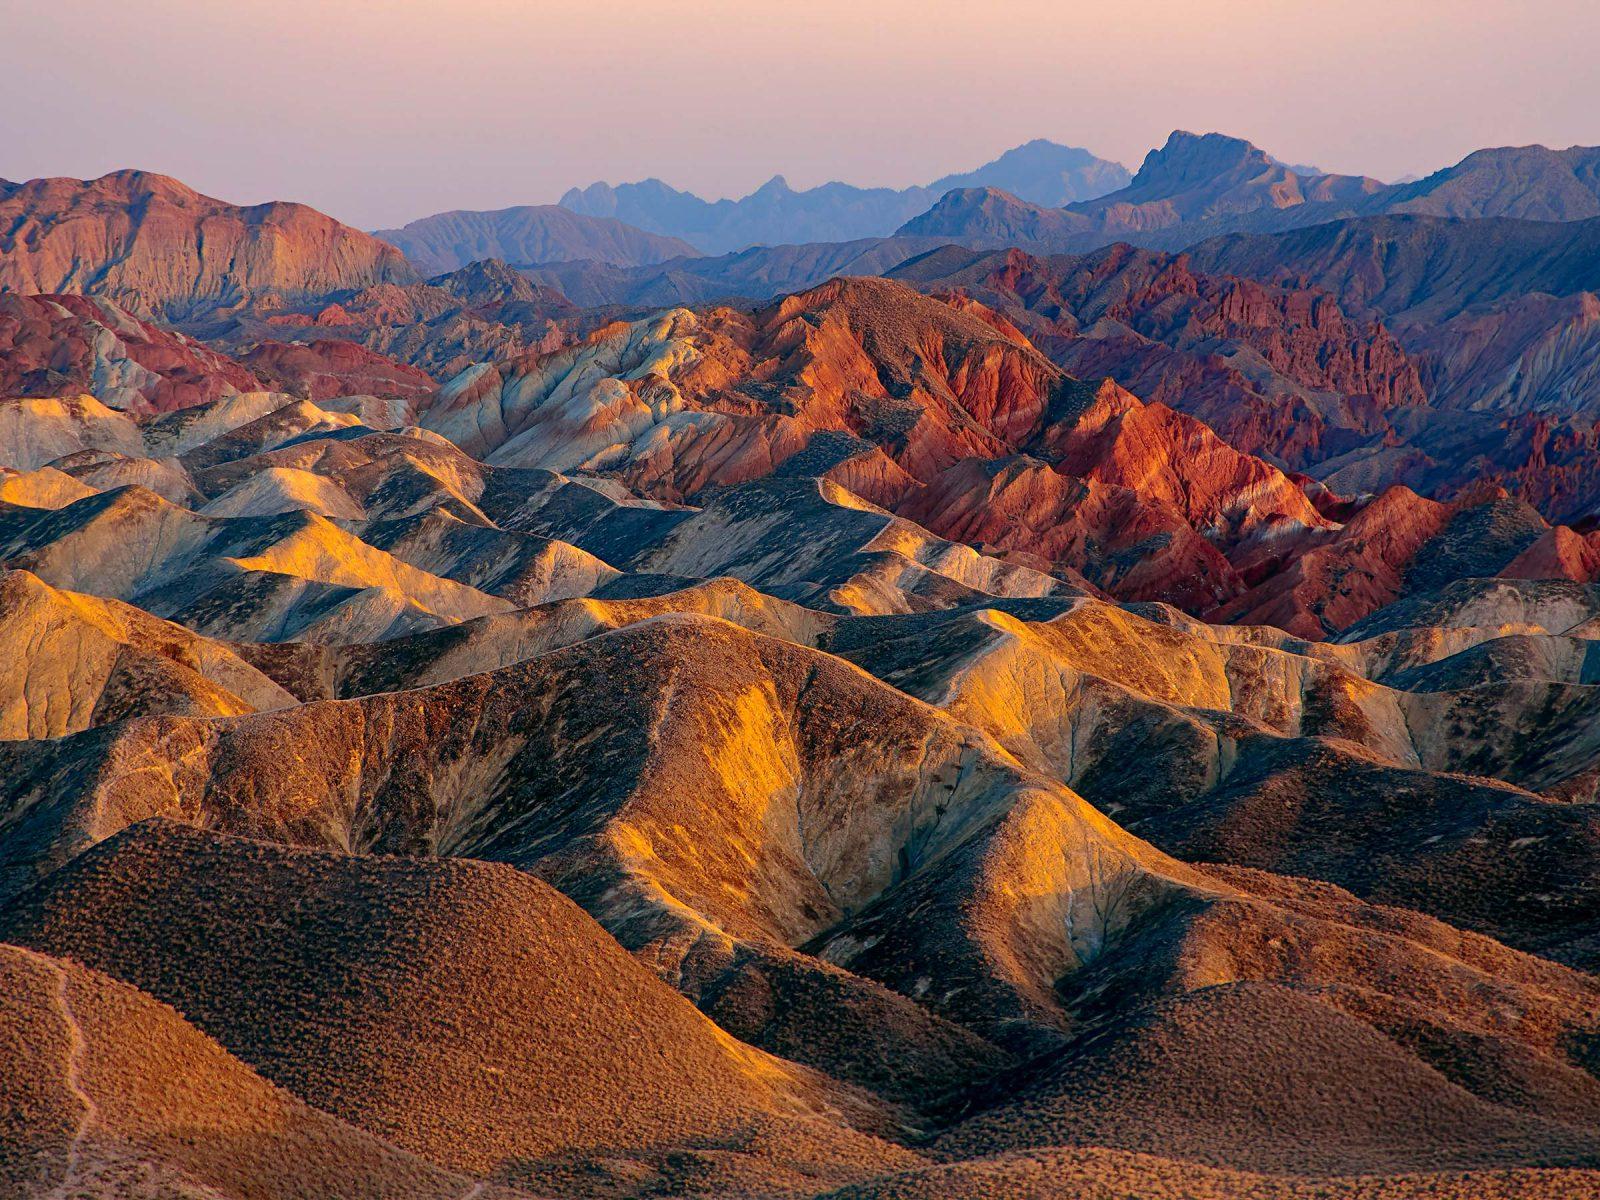 Zhangye Danxia landform in Gansu Province, China. Photograph © iStock.com/rickwang.